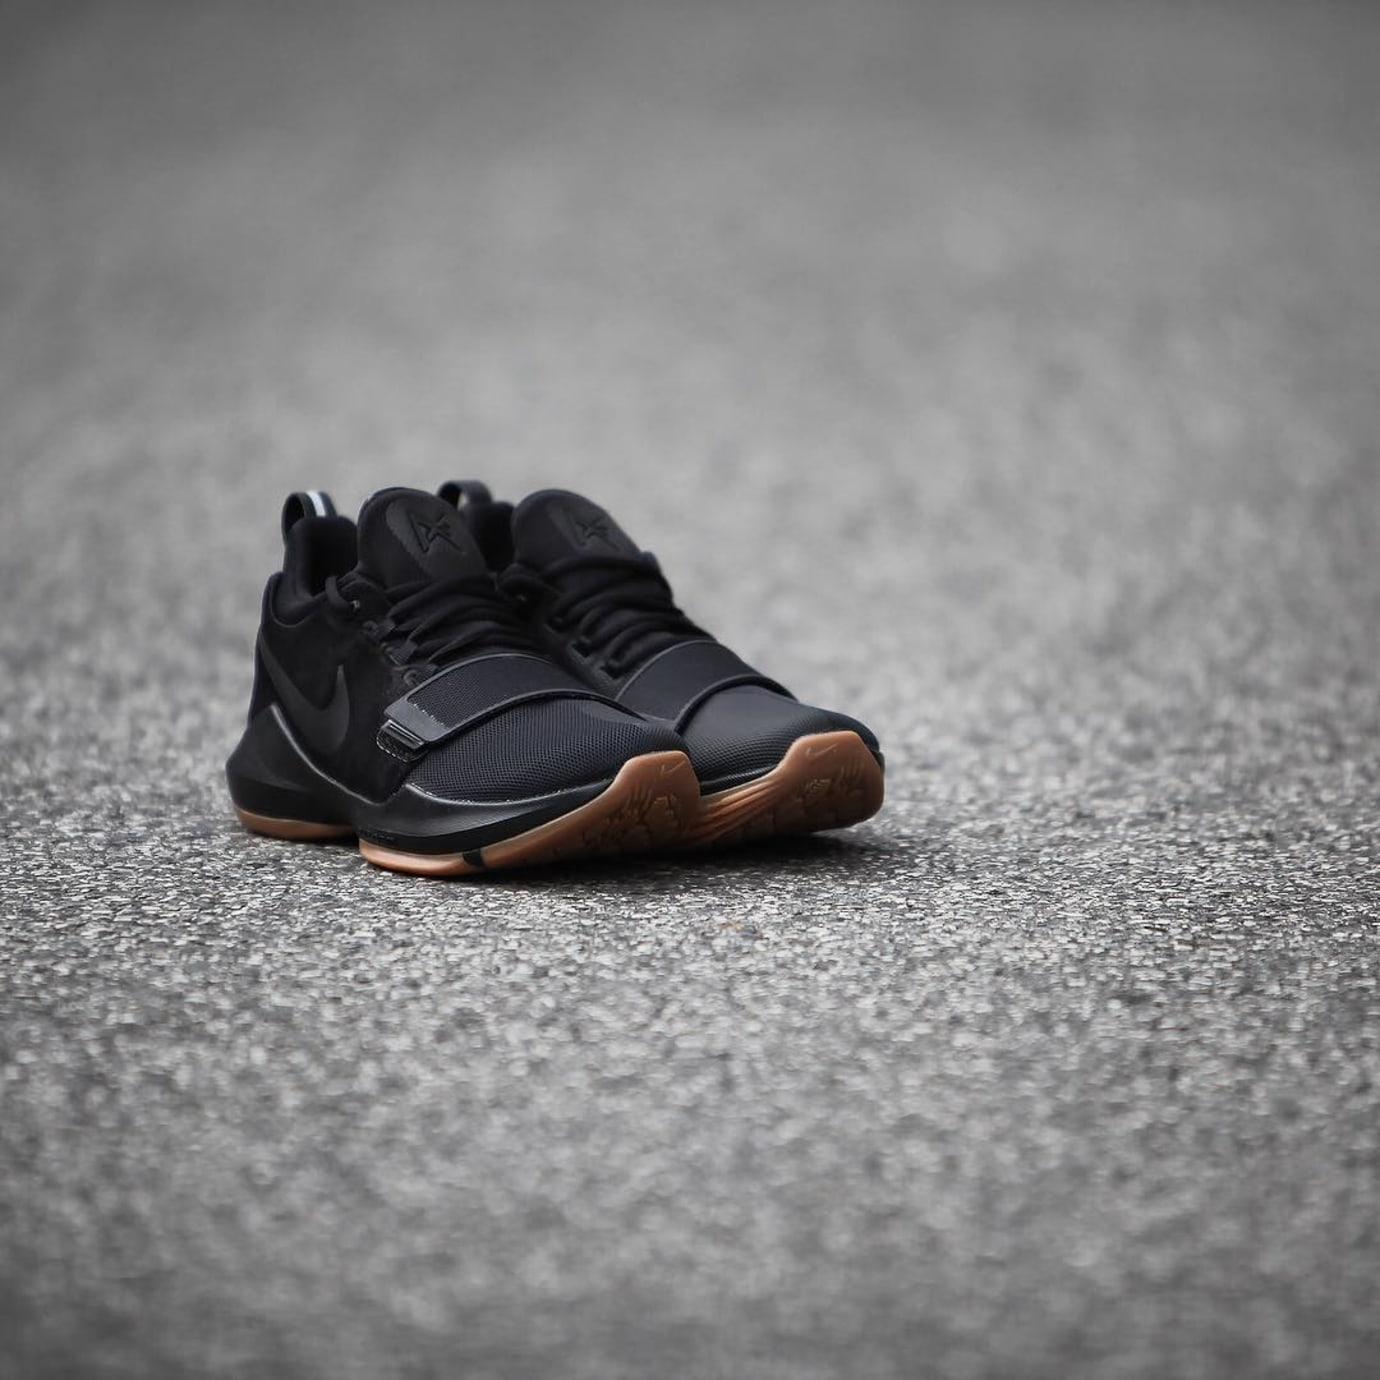 Nike PG1 Black Gum Release Date 878627-004 (3)